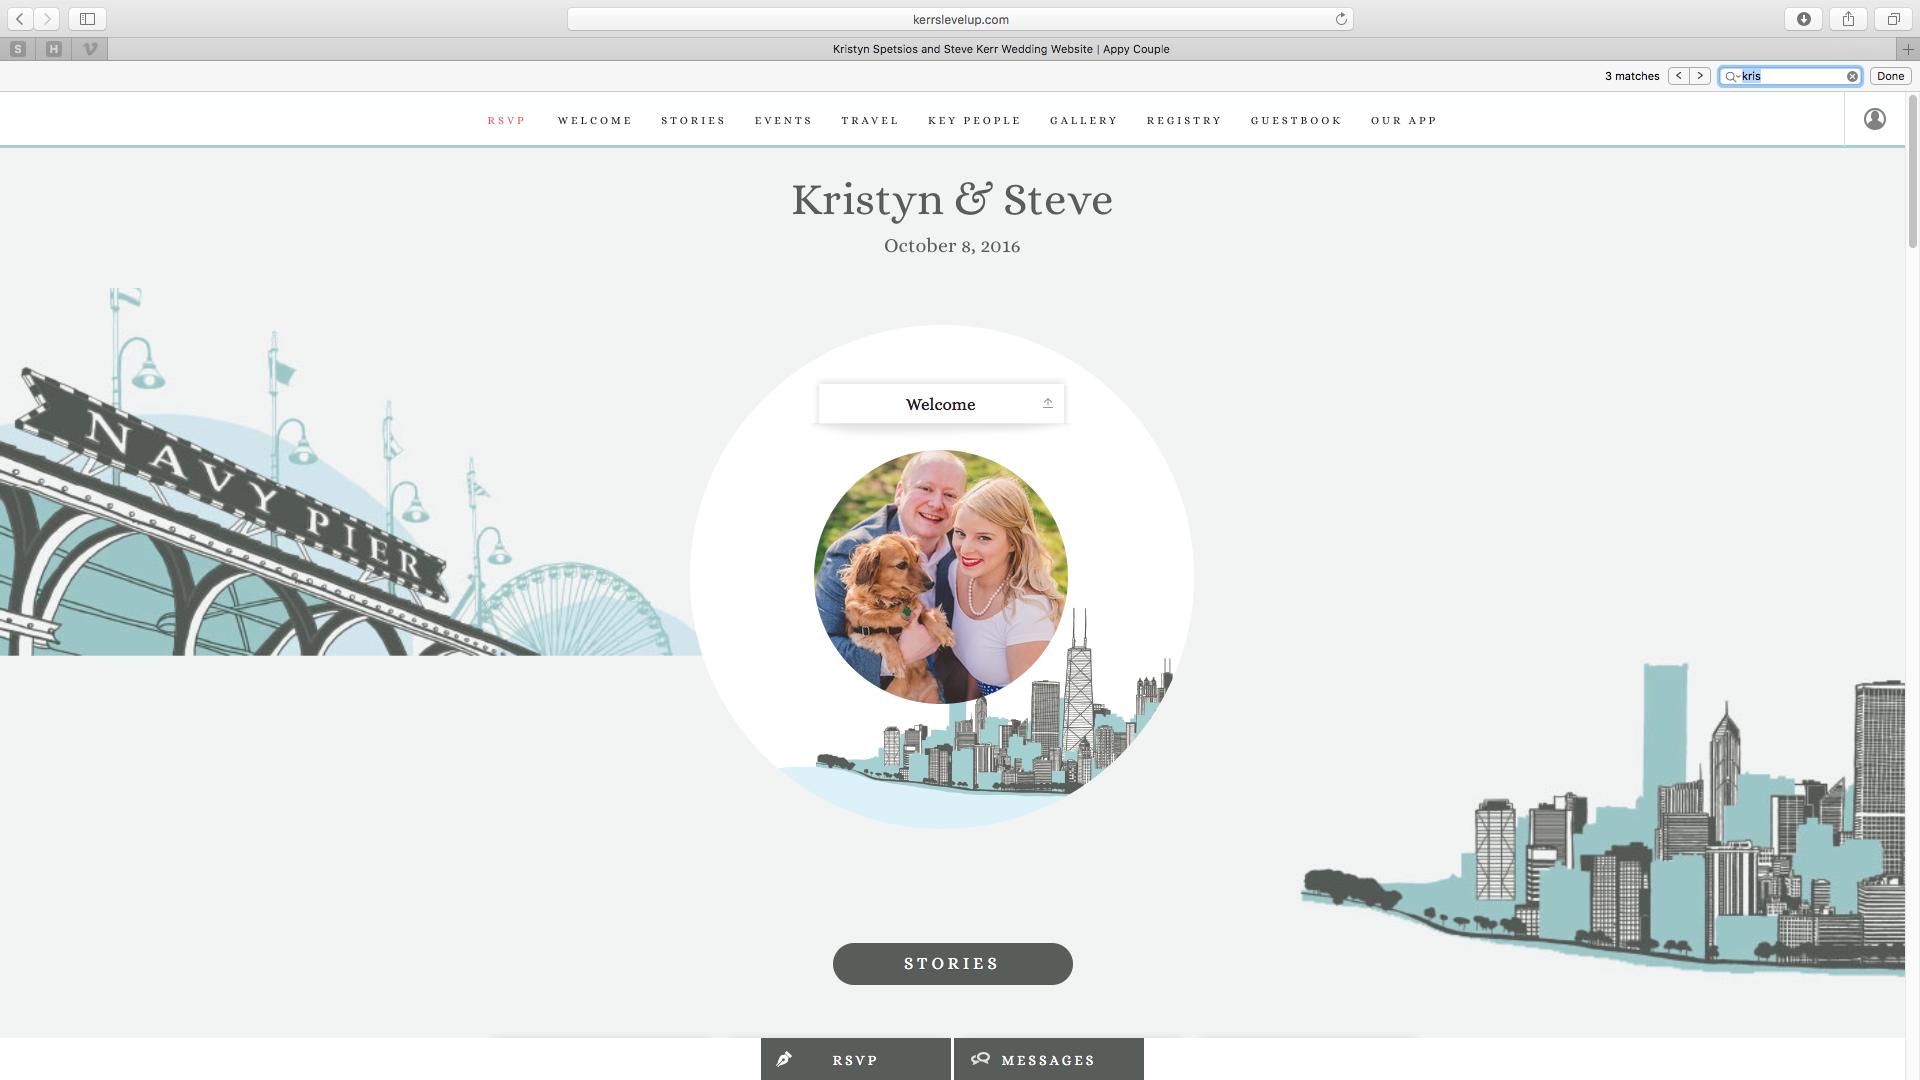 Click image to visit Kristyn + Steve's Wedding Website